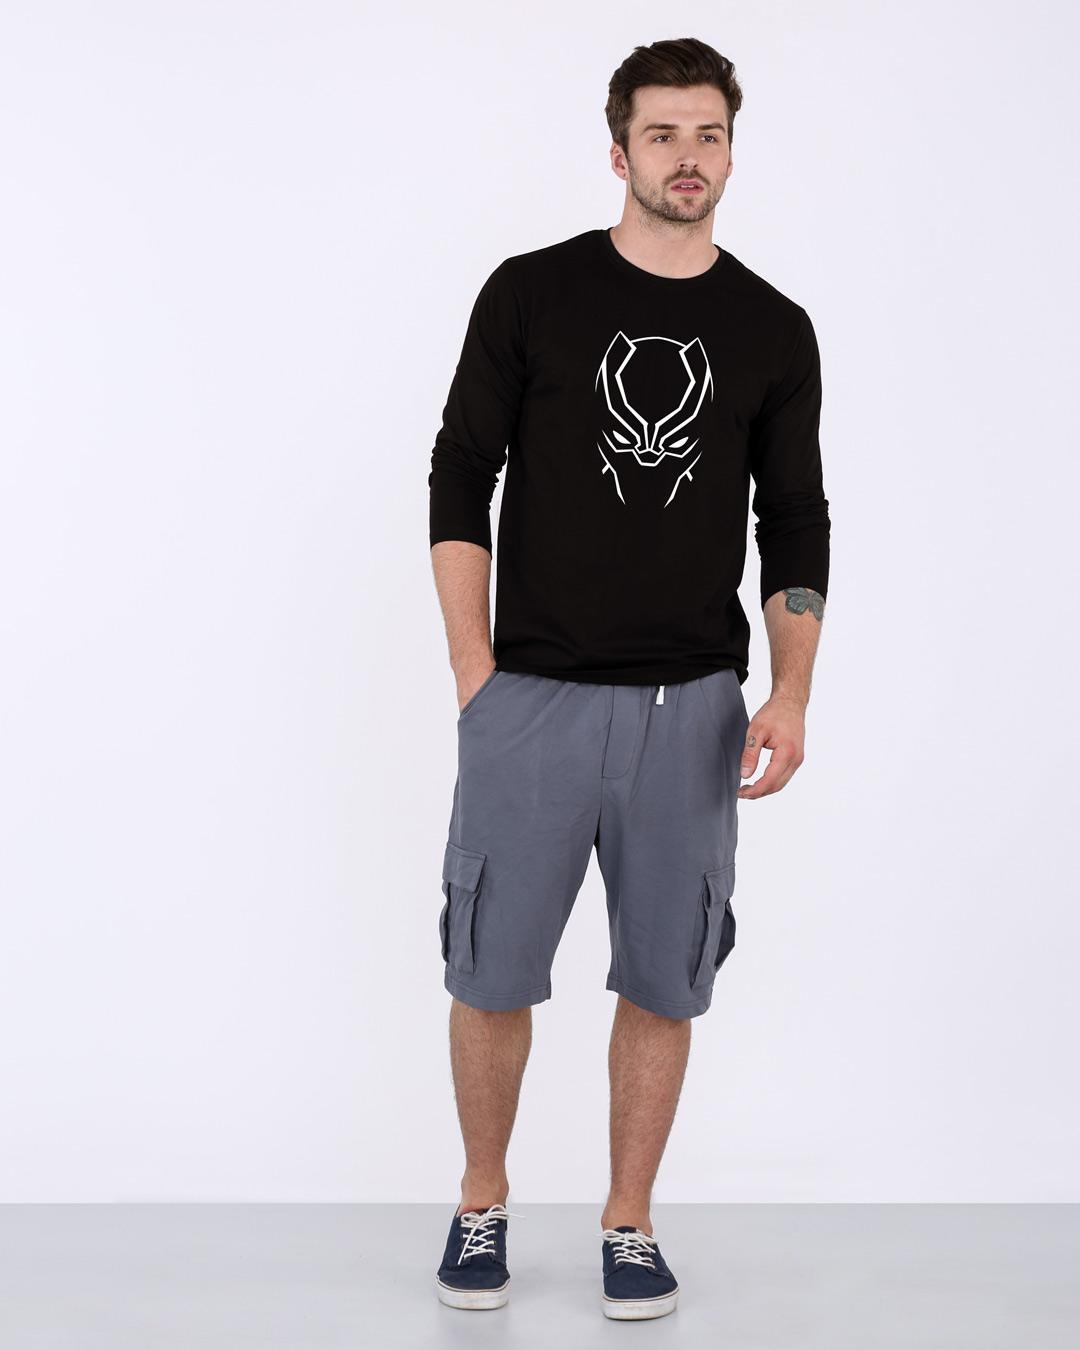 3cec61f10 Buy Black Panther Minimal (GID) Printed T-Shirt For Men Online India @  Bewakoof.com